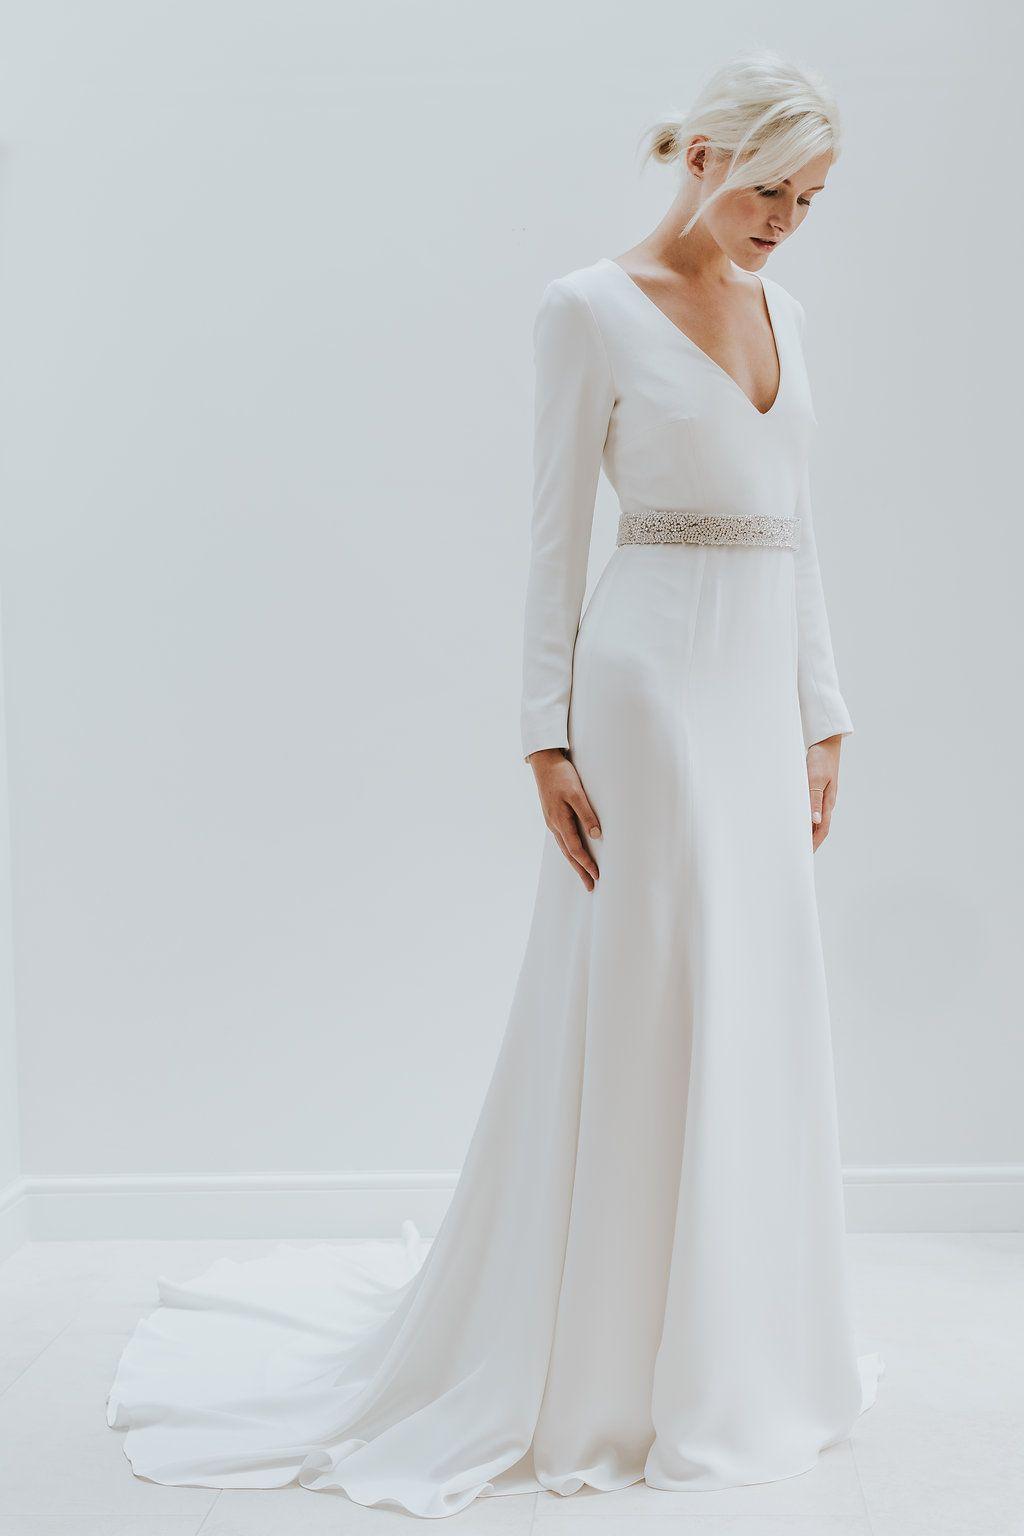 233b0af33e4c Elegant   Minimal Bridal Gowns by Charlotte Simpson